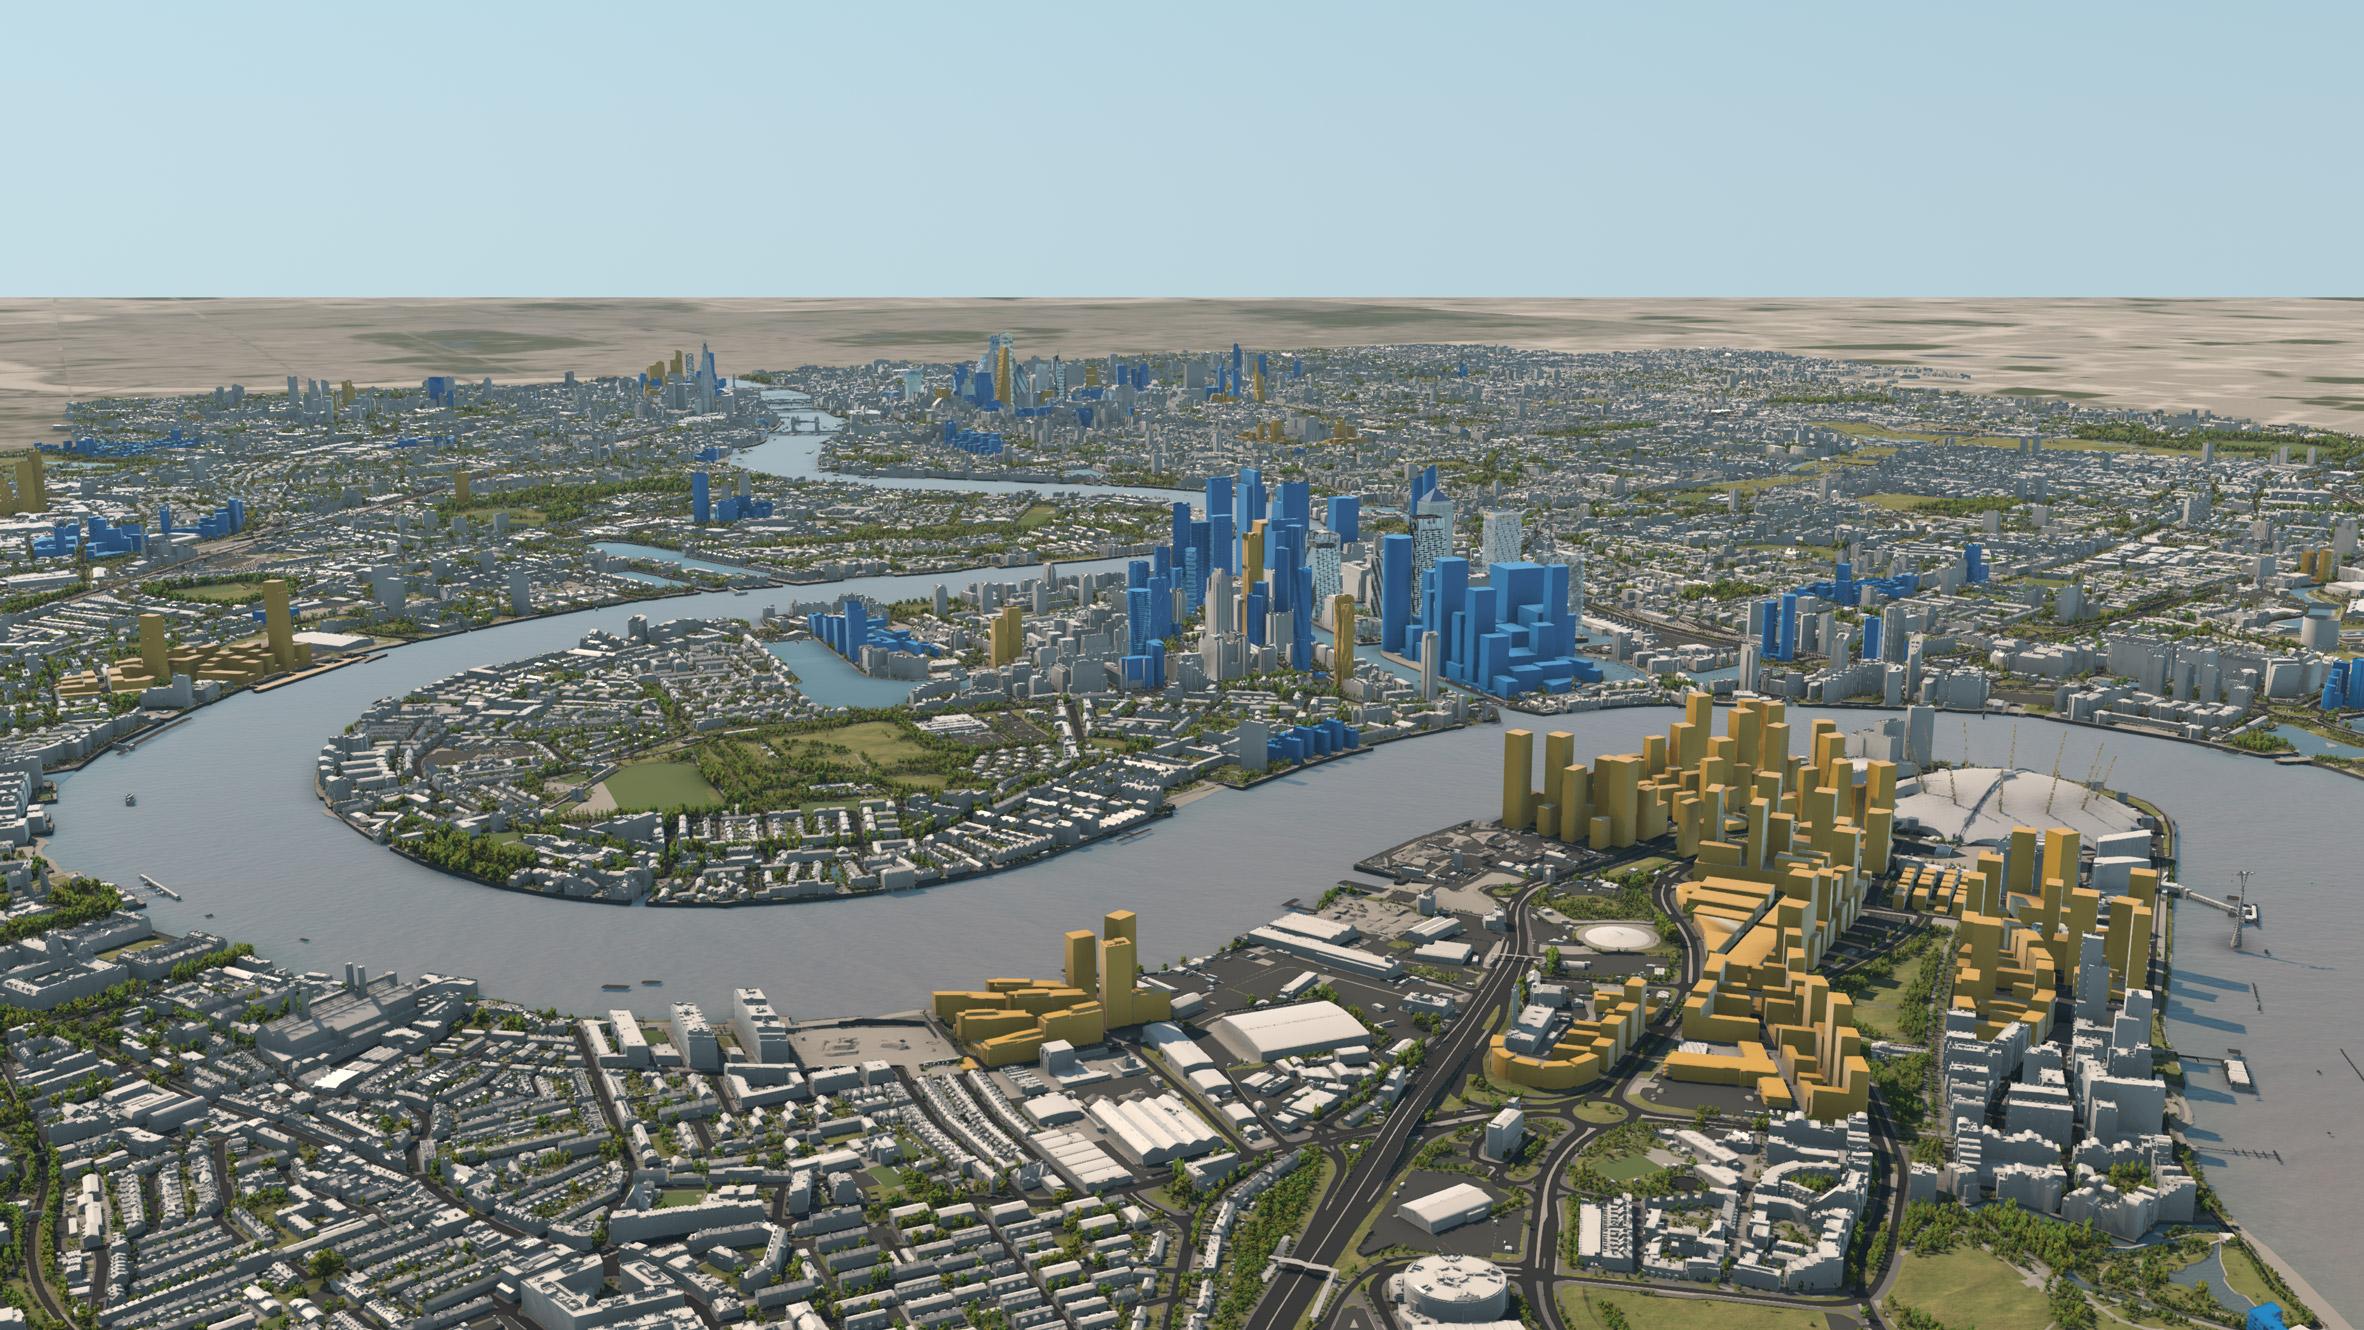 nla-tall-building-survey-2018-london-skyline-pipelineg-greenwich-peninsula-vucity-hero_b.jpg